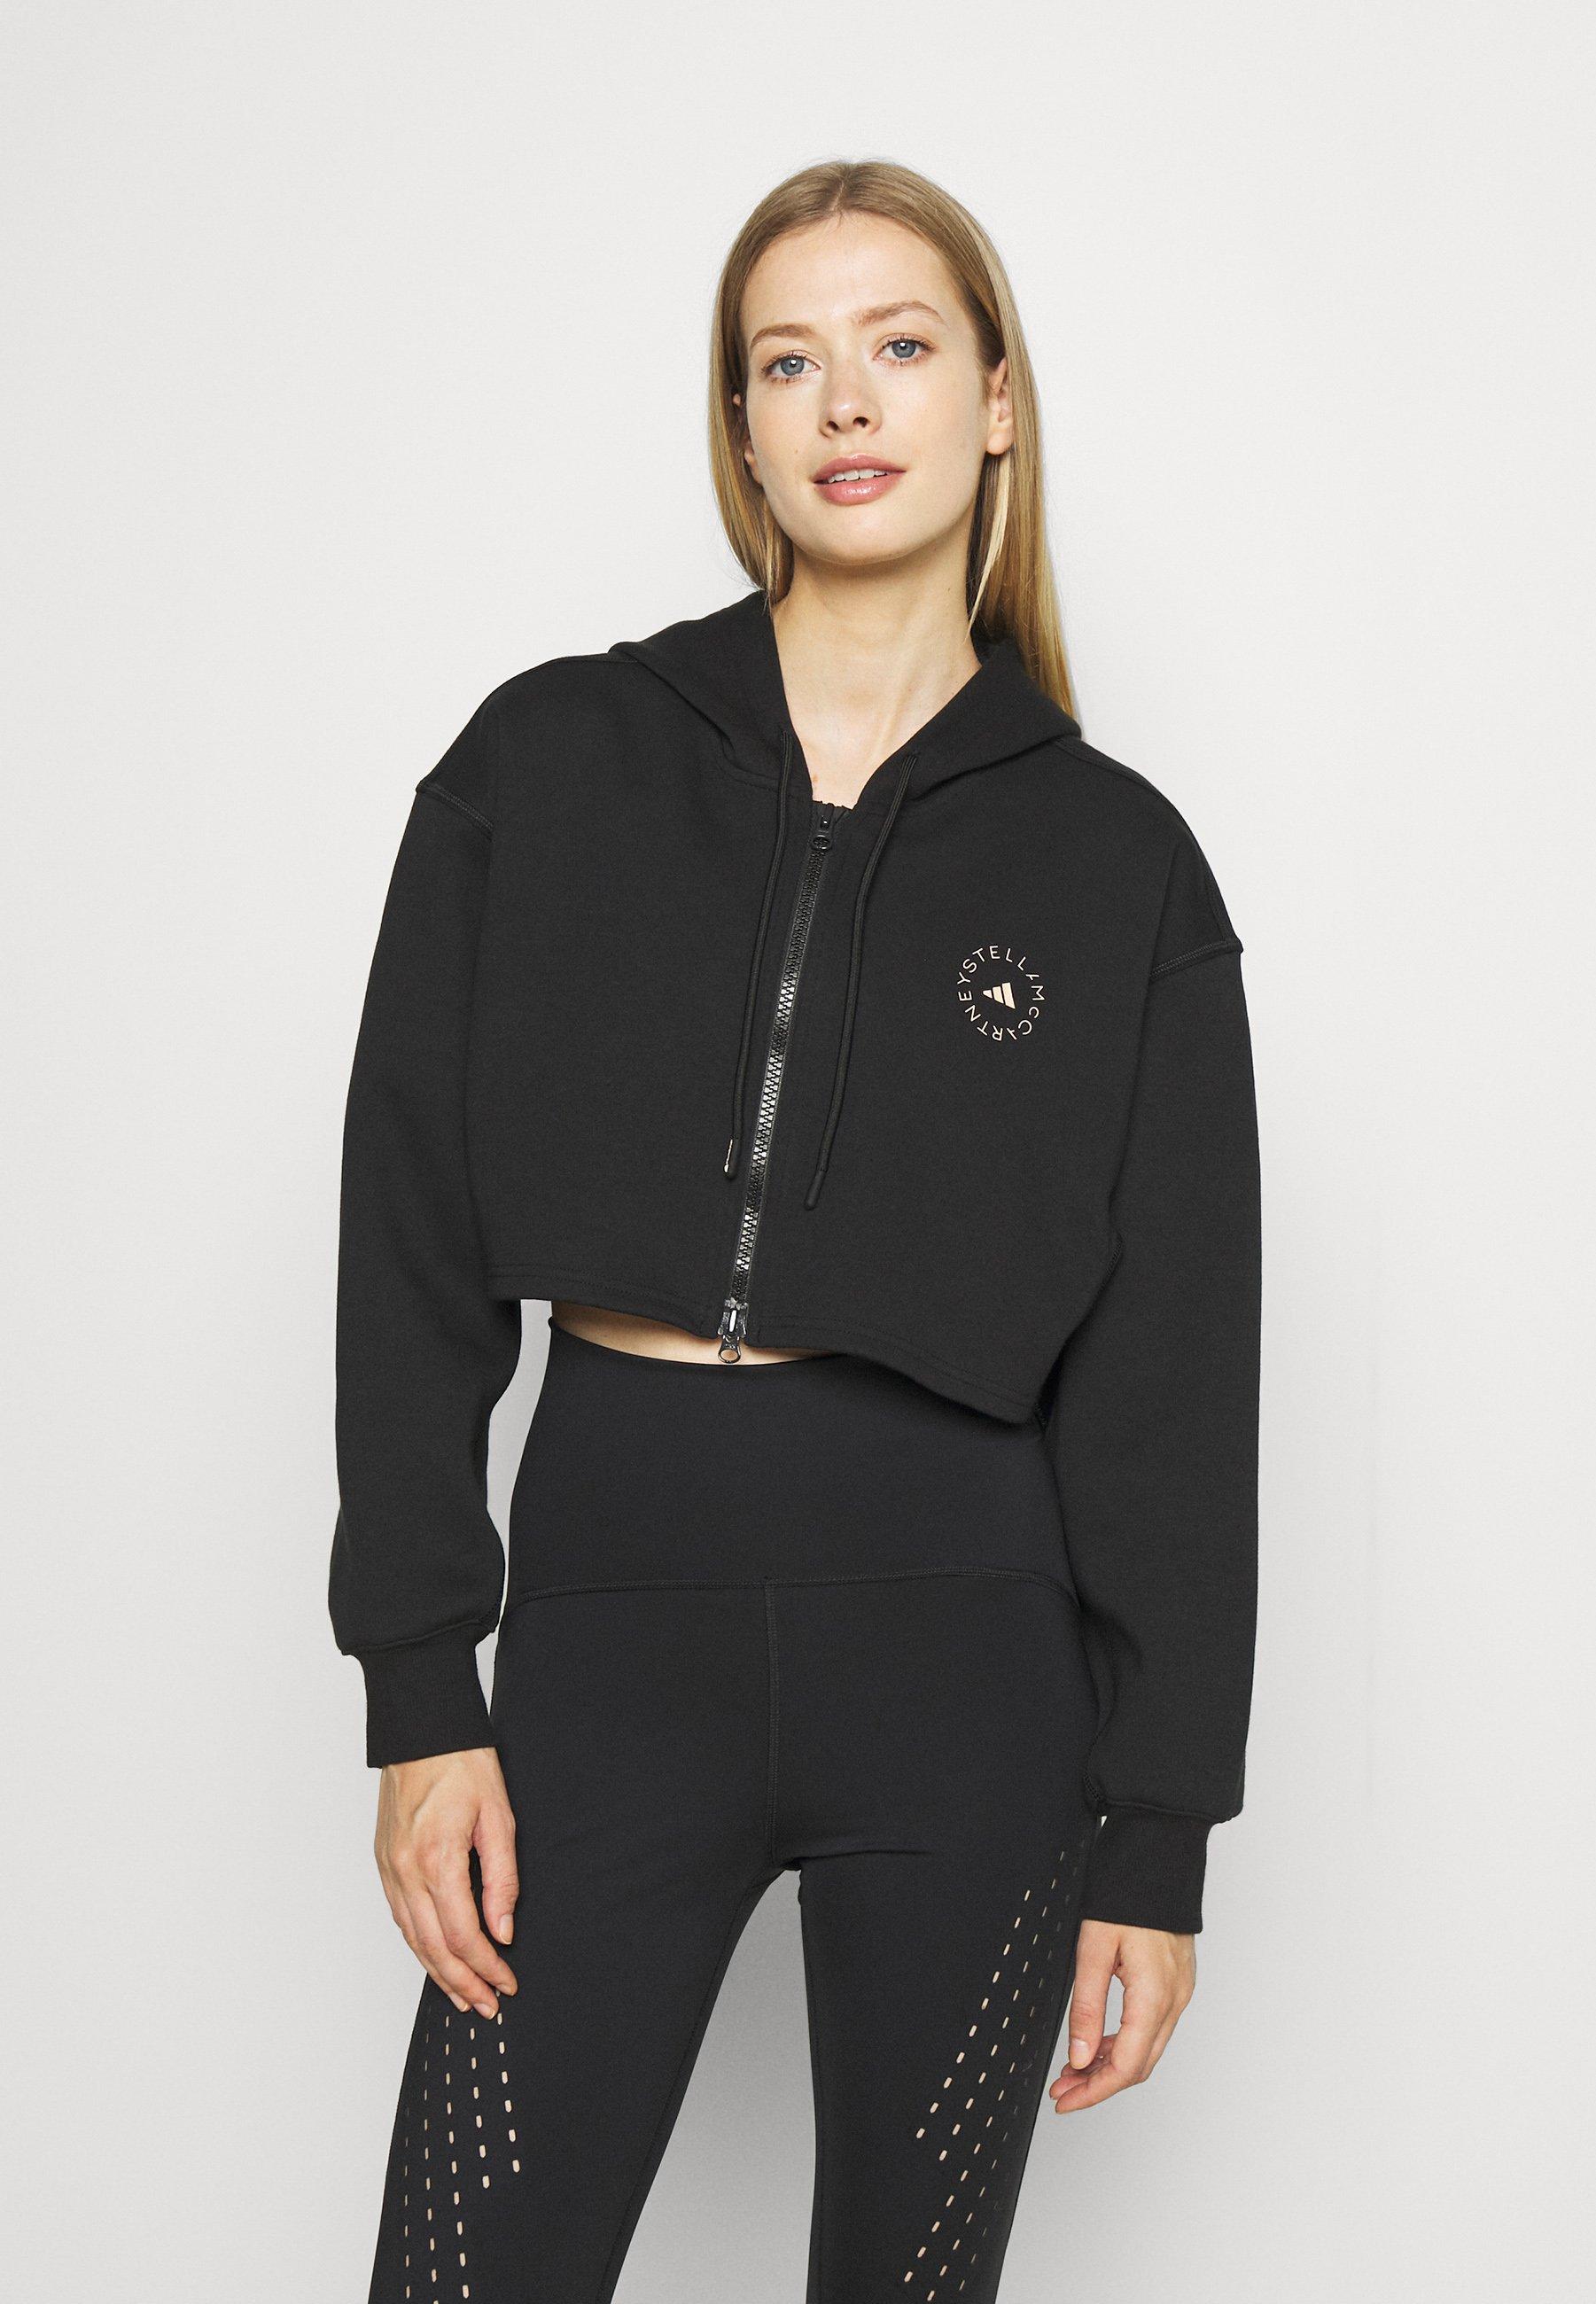 Women ADIDAS BY STELLA MCCARTNEY SC CR HOOD TRAINING WORKOUT PRIMEGREEN HOODED TRACK TOPHOOD - Zip-up sweatshirt